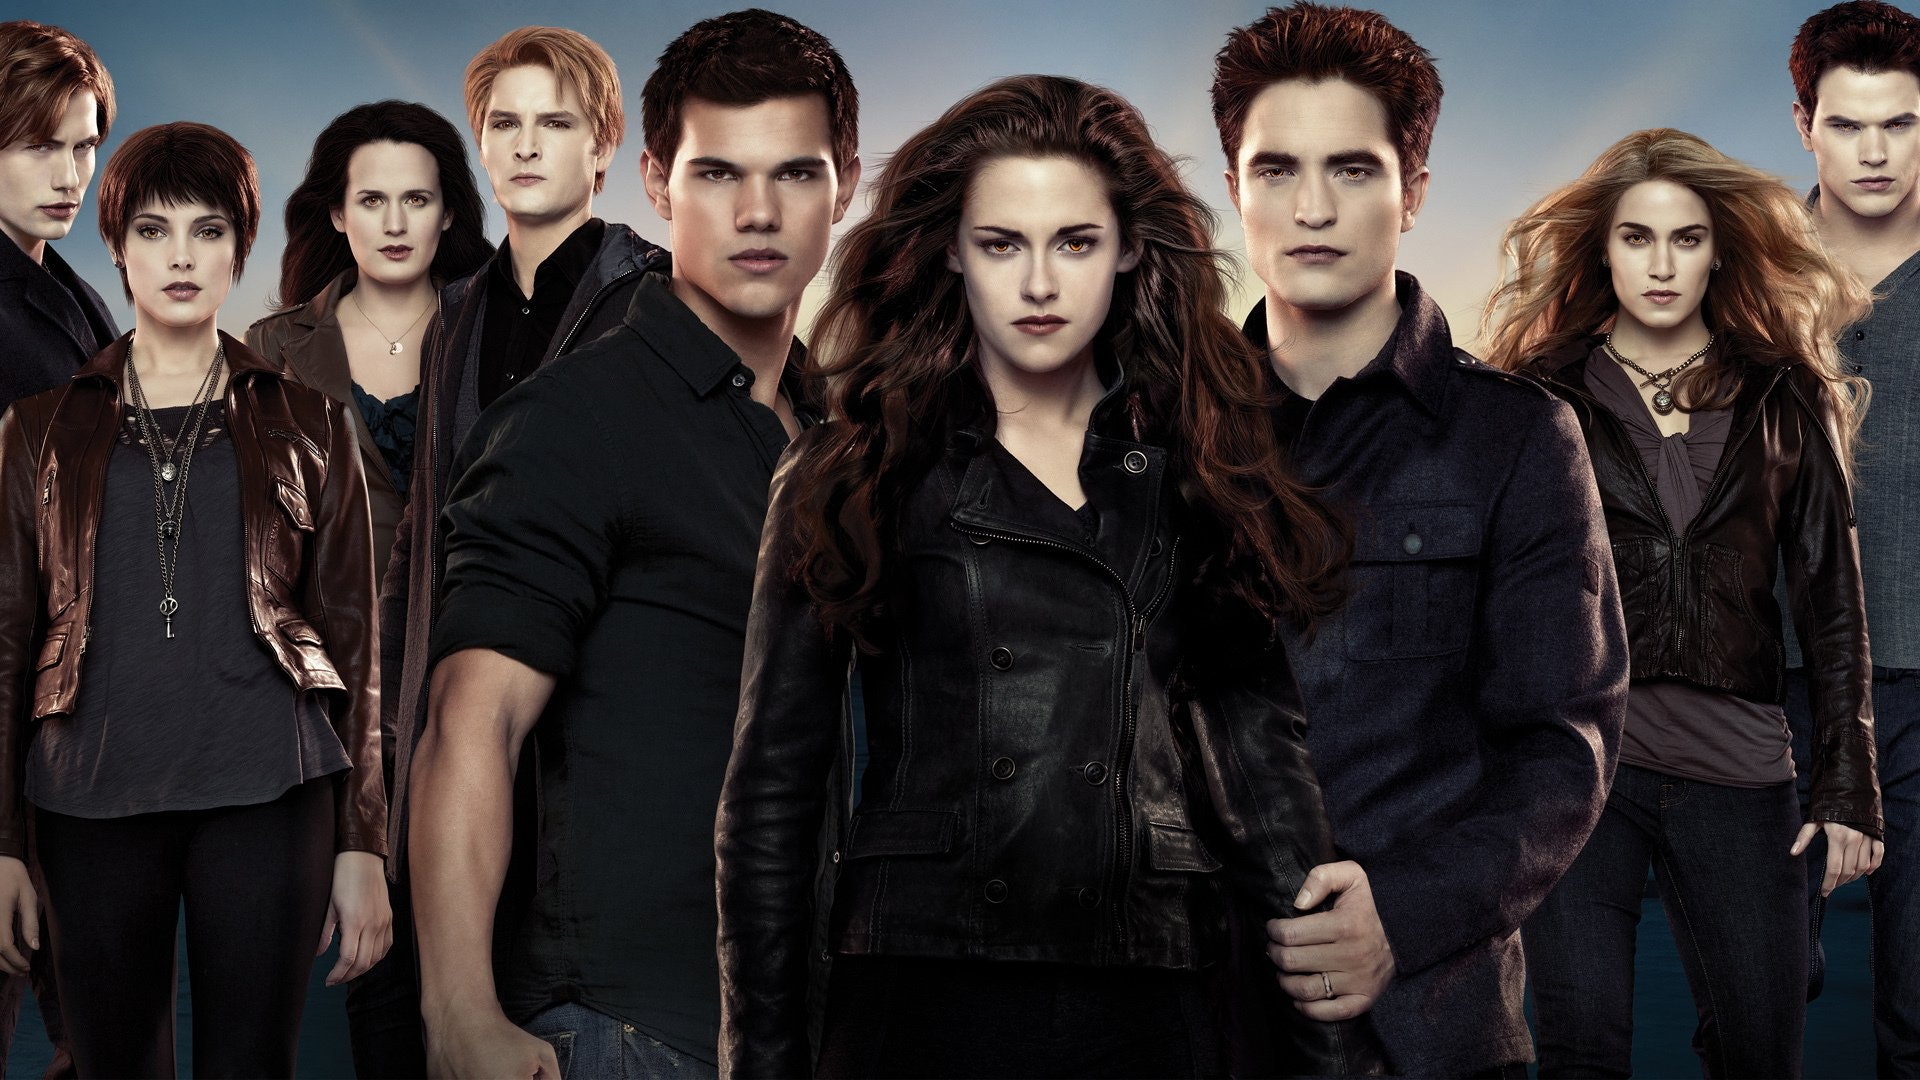 The Twilight Saga: Breaking Dawn - Part 2 Soundtrack